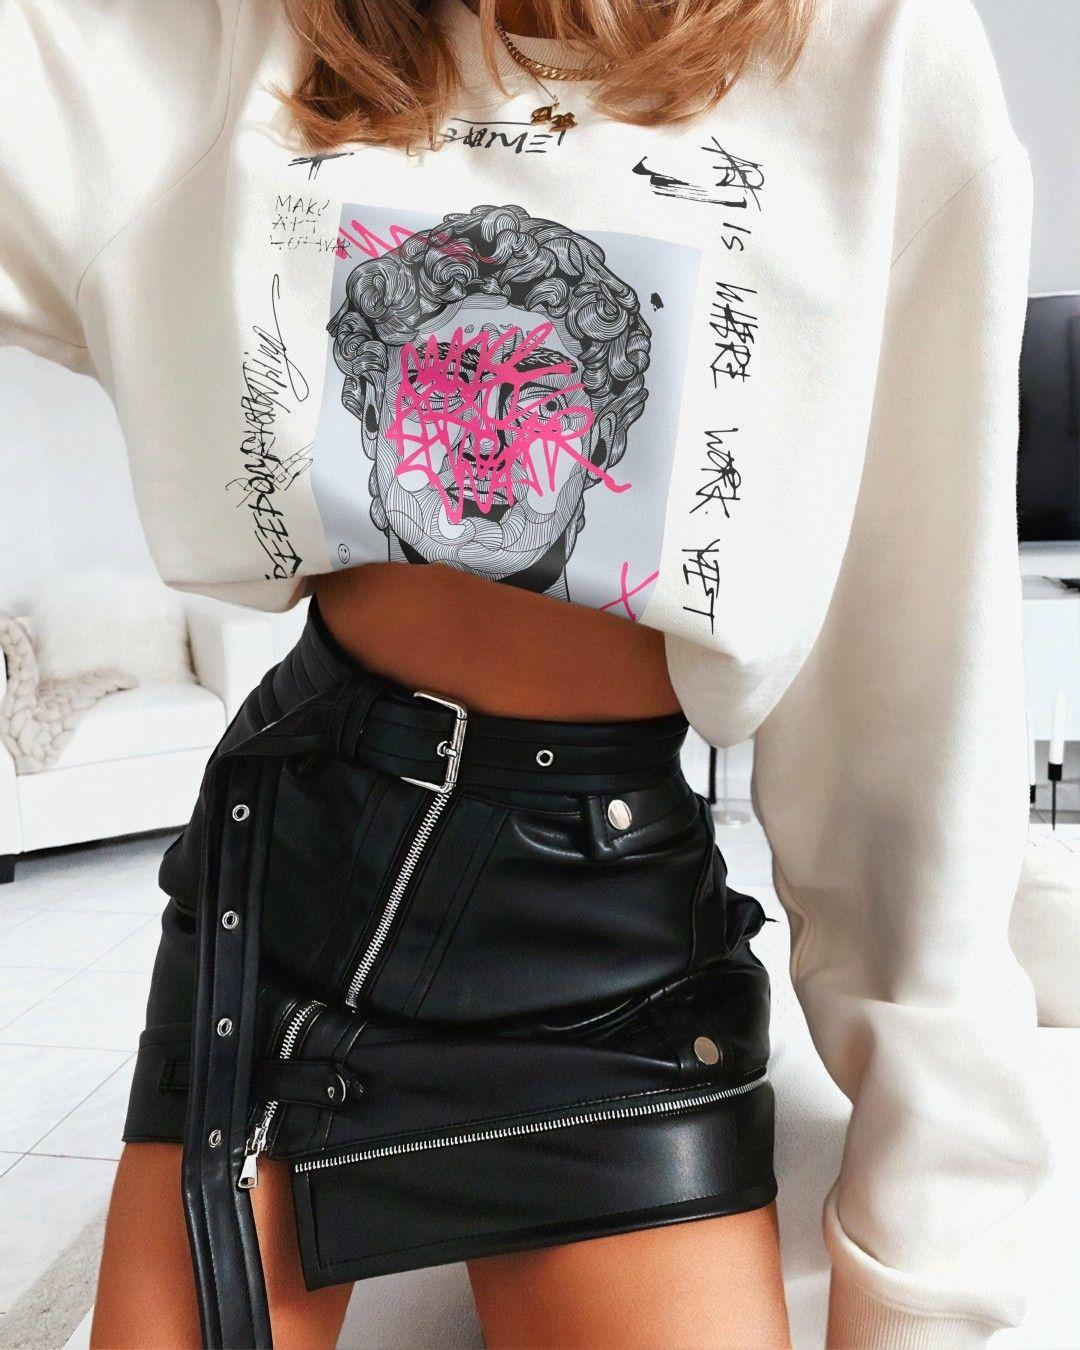 Sweatshirt Summer Sale ❤️ Tap the image to shop 👆